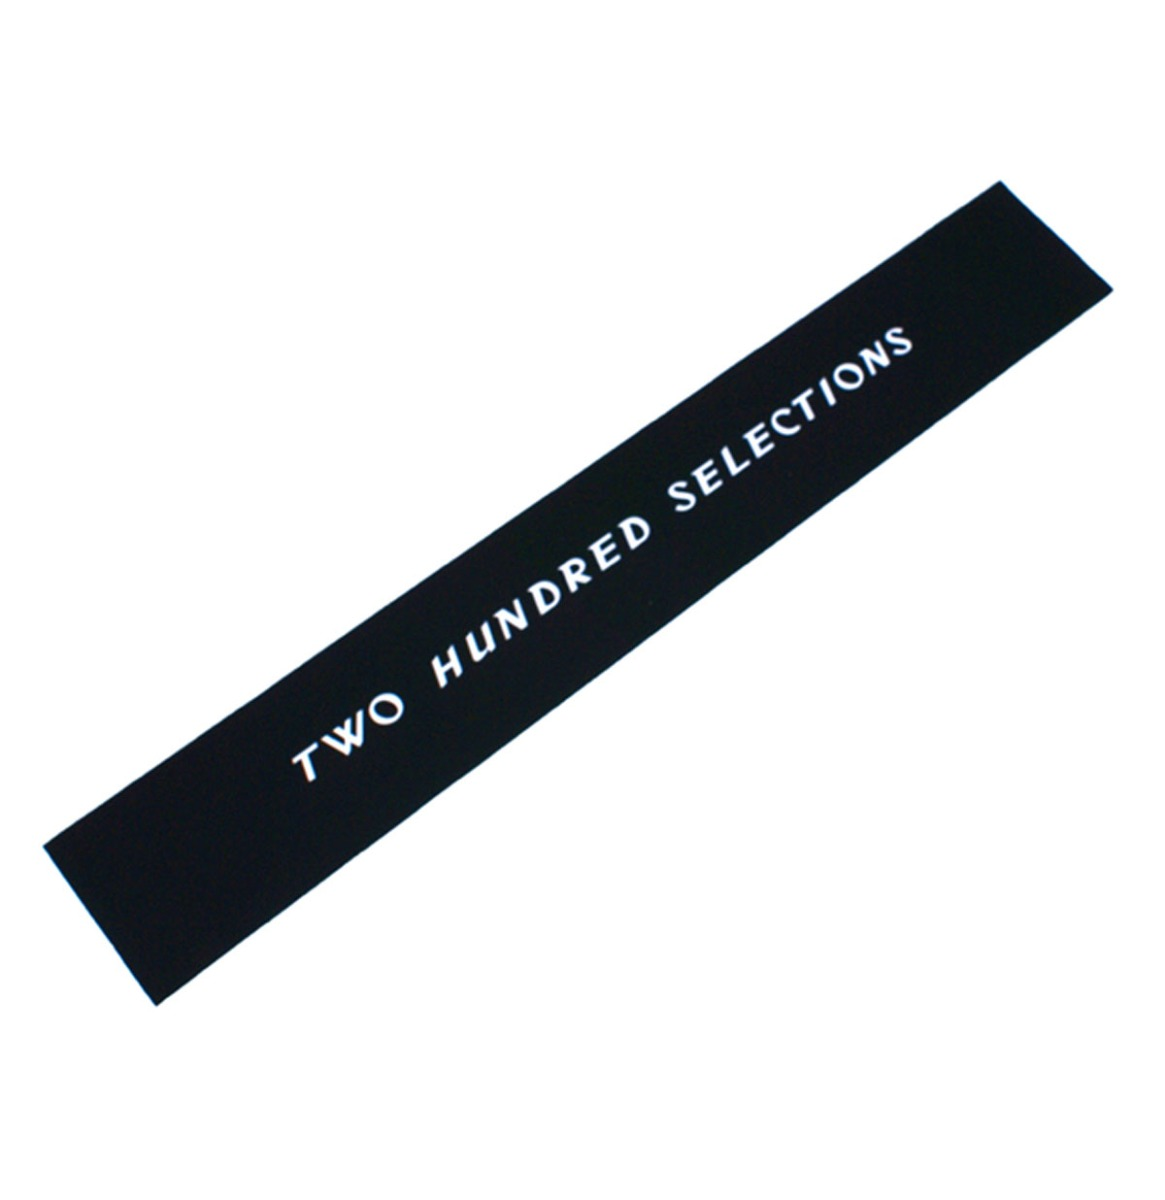 AMI I Jukebox Sticker Voor Mechanisme Voorruit Twee Honderd Selecties